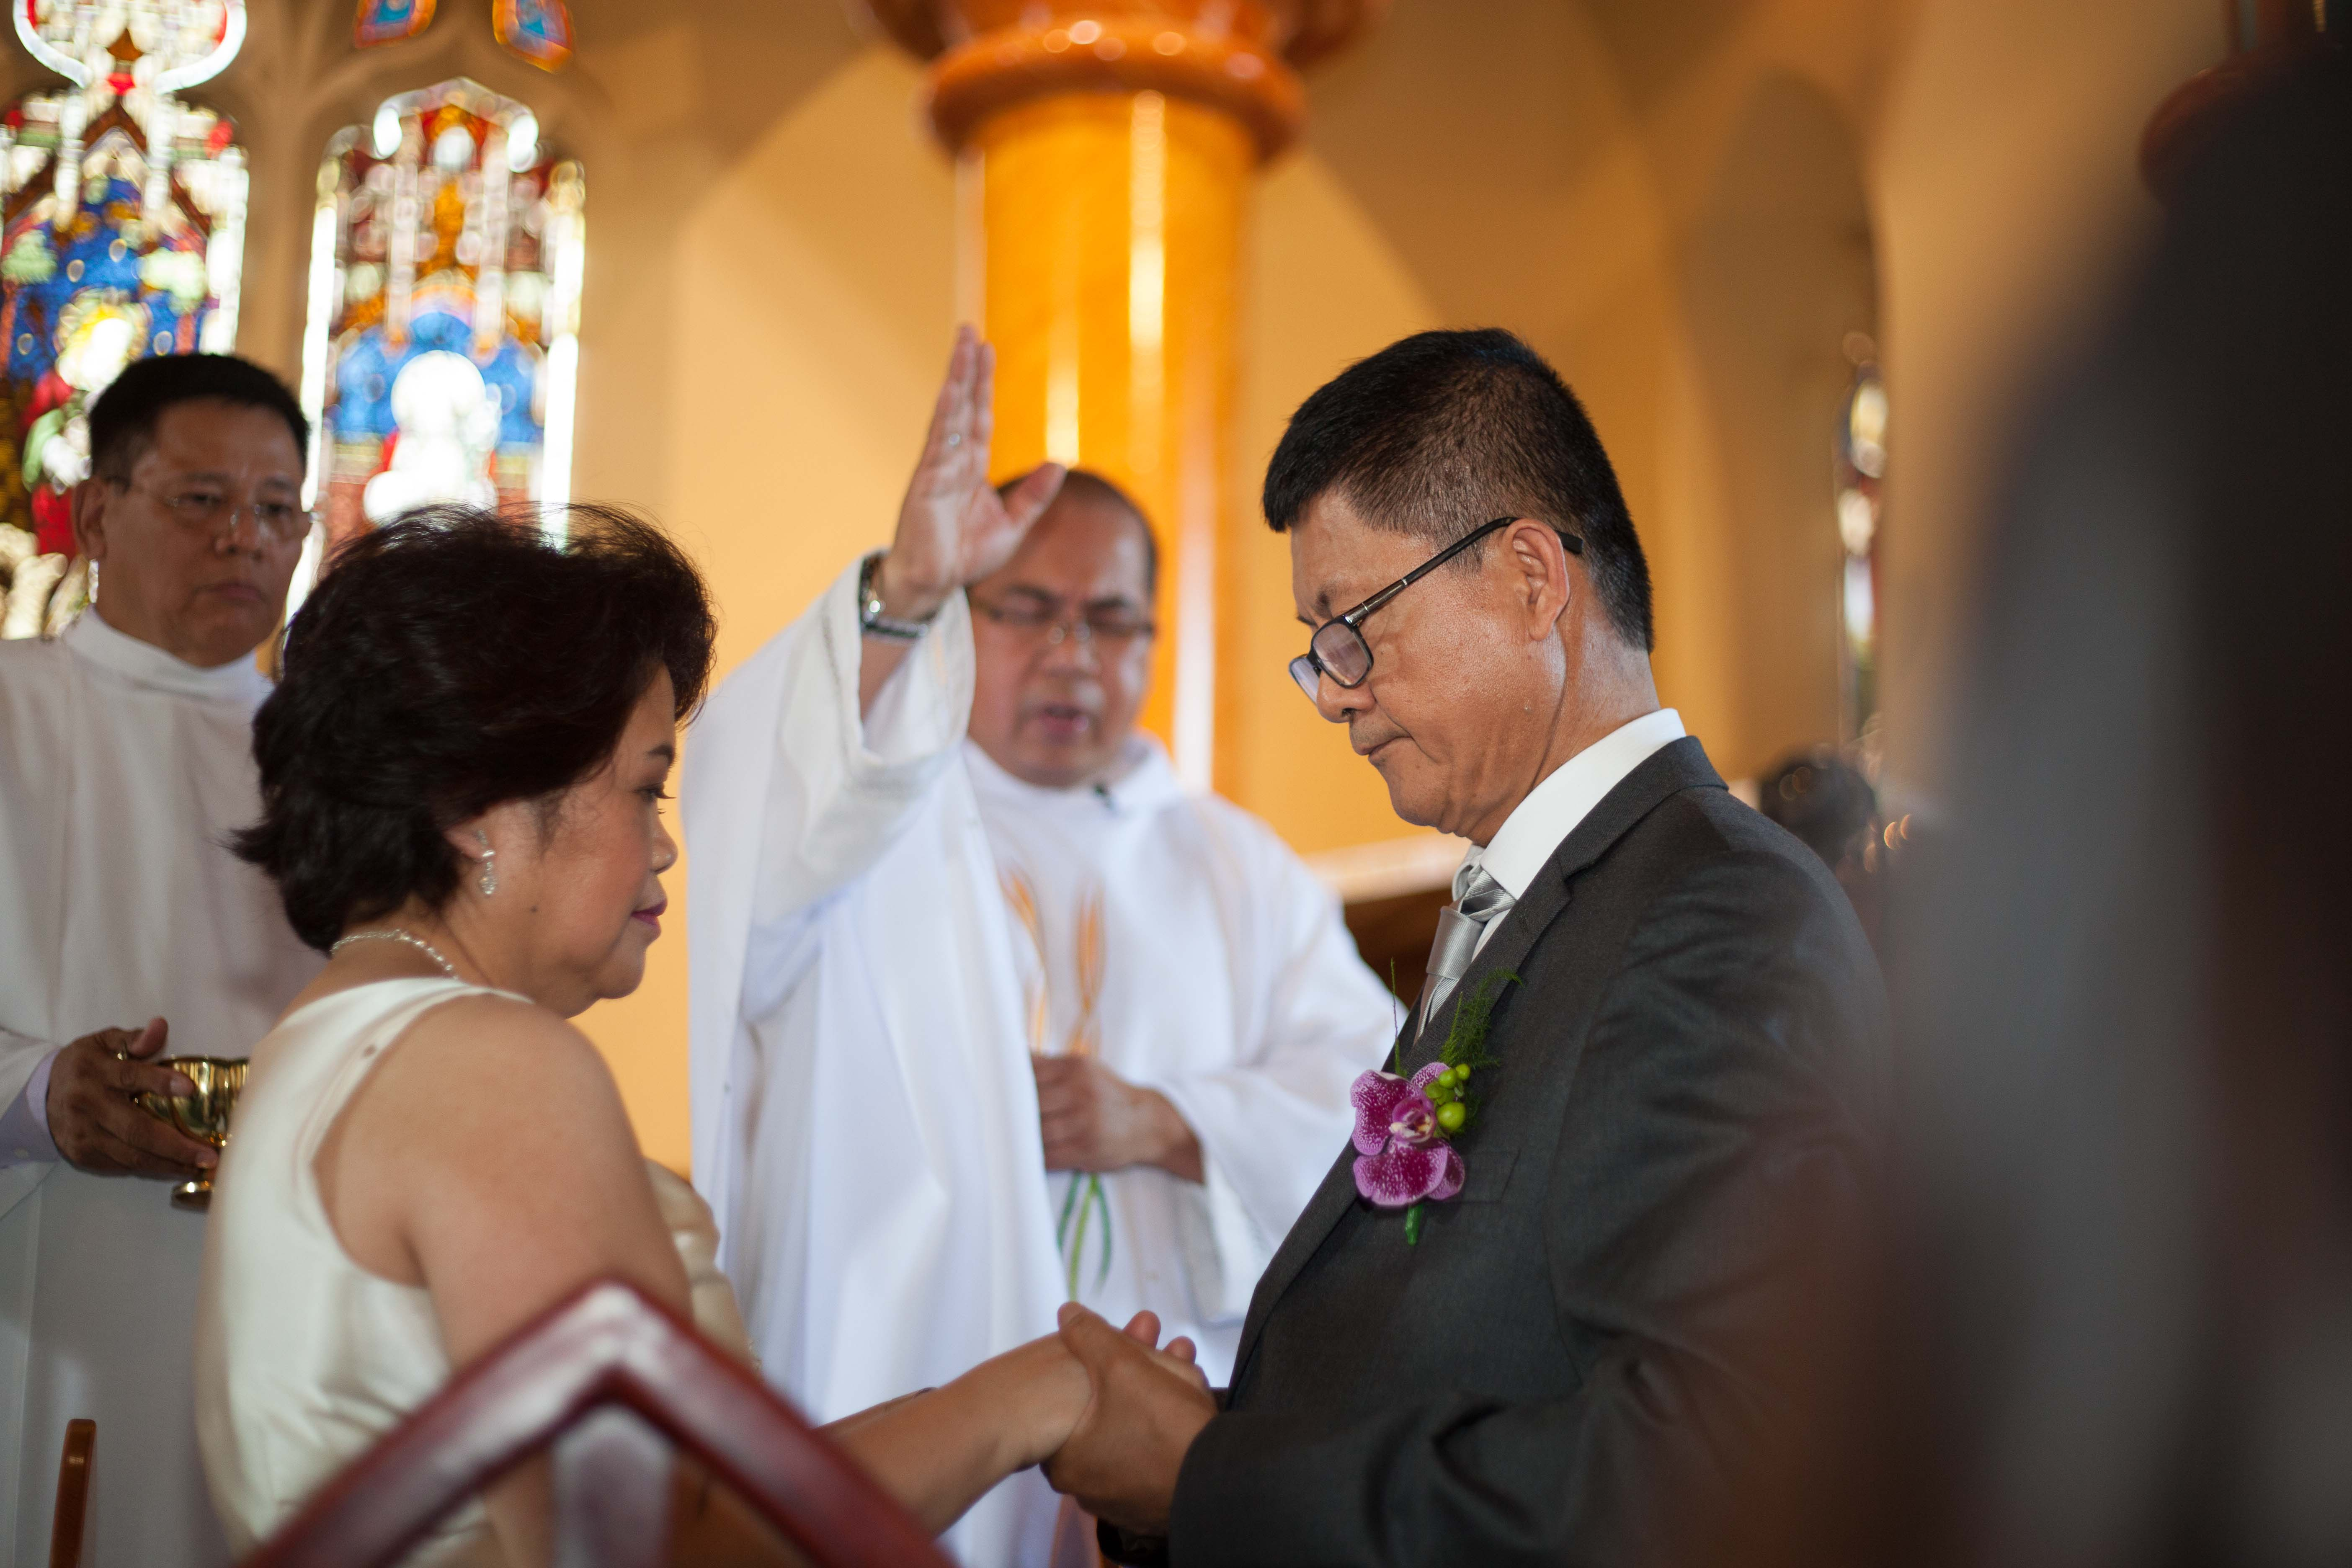 Sydney australian fillipino wedding couple in church